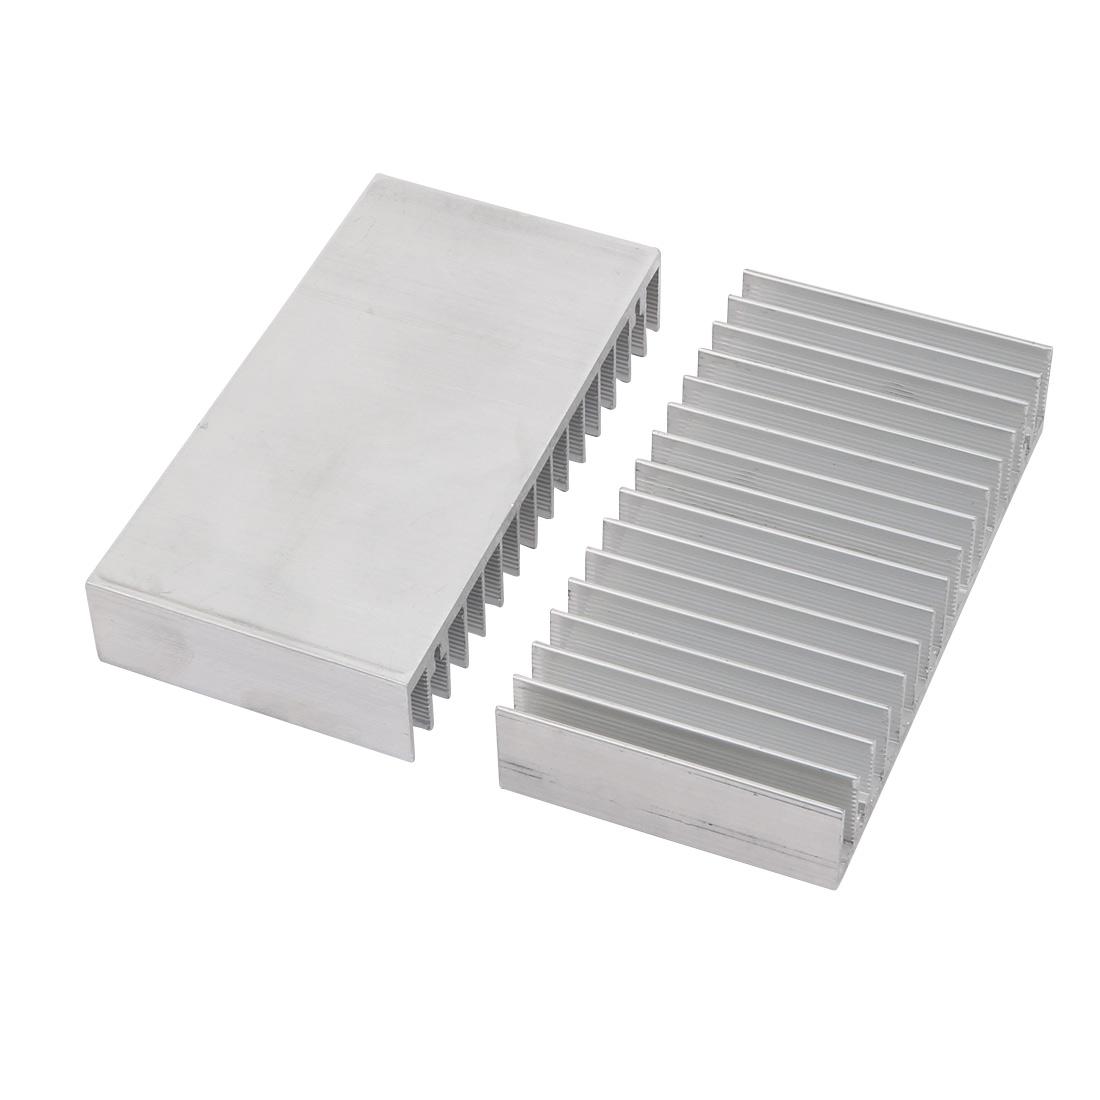 2pcs Aluminum Heat Diffuser Heatsink Cooling Fin 100mmx52mmx18mm for LED Lamp